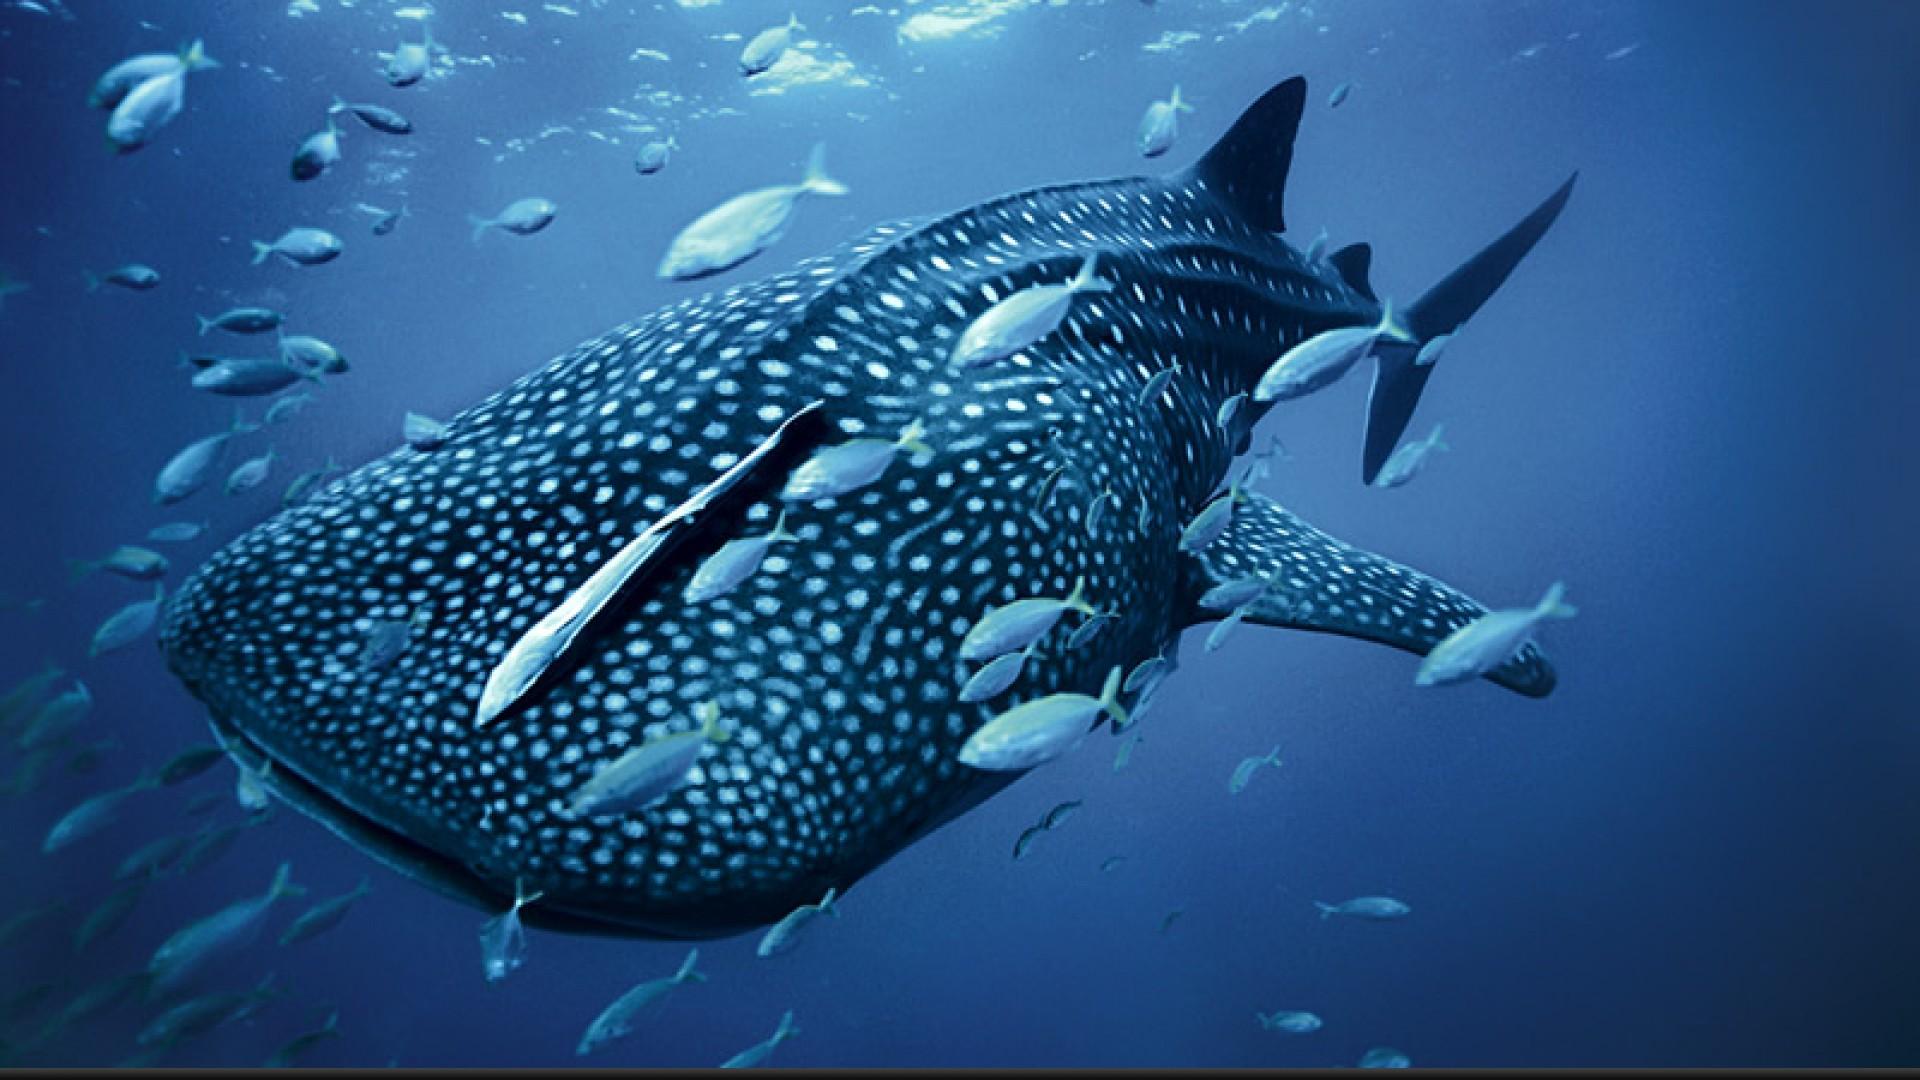 Megamouth Whale Shark HD Desktop Wallpaper HD Desktop Wallpaper 1920x1080